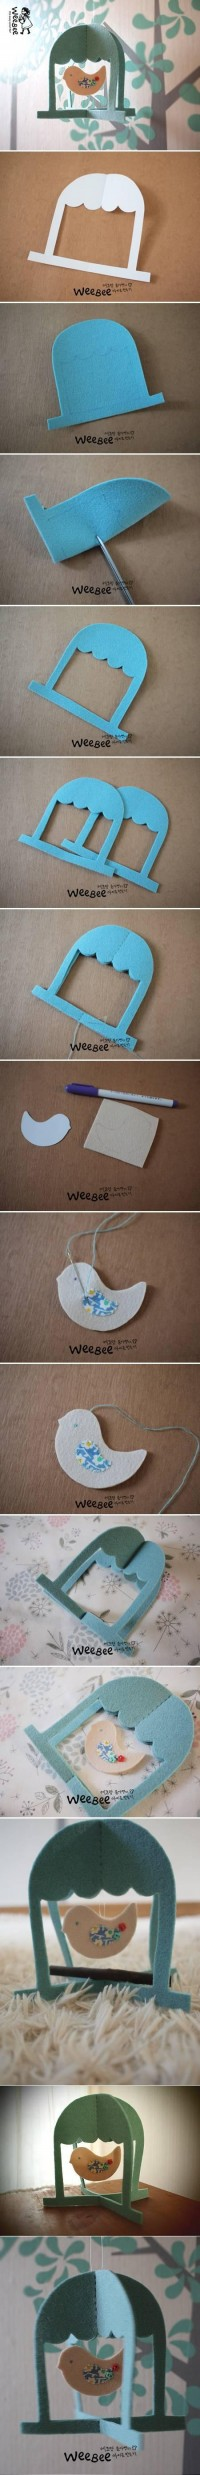 DIY Cute Felt Bird Mobile DIY Projects | UsefulDIY.com